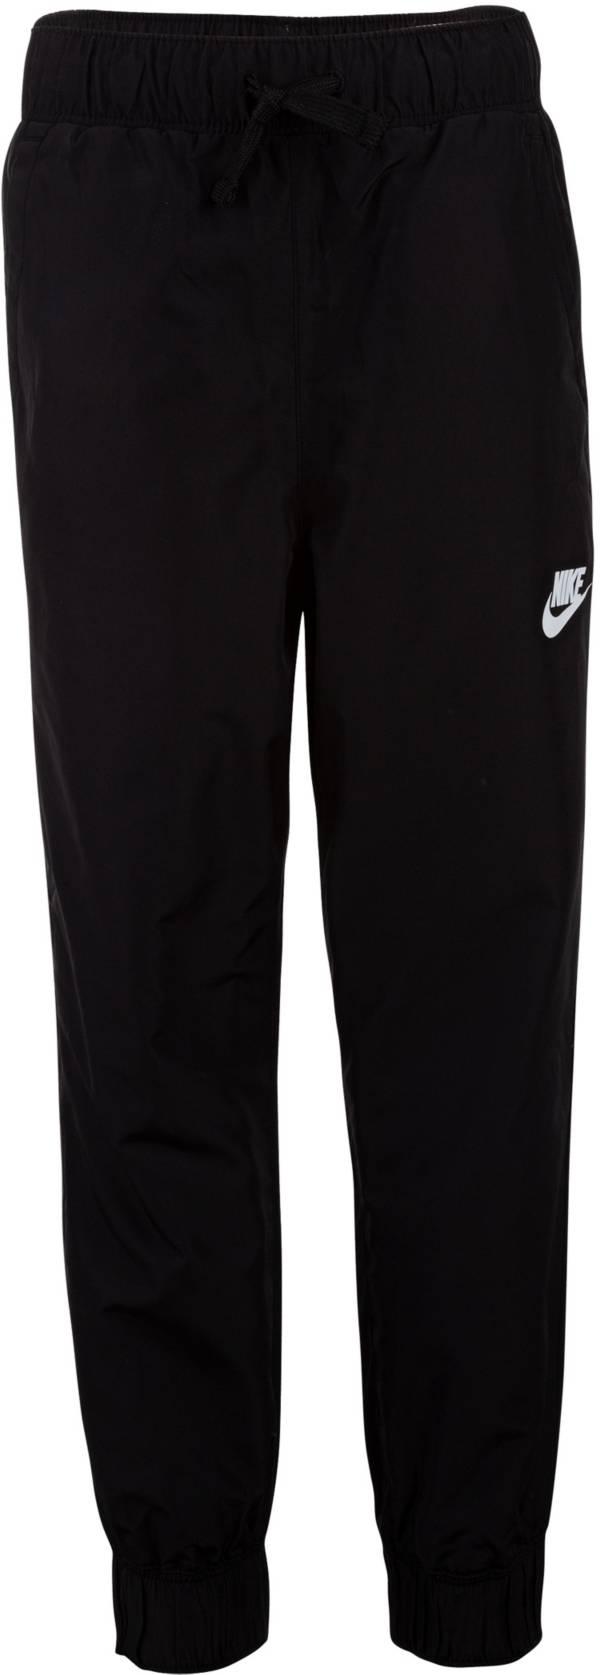 Nike Boys' Woven Jogger Pants product image